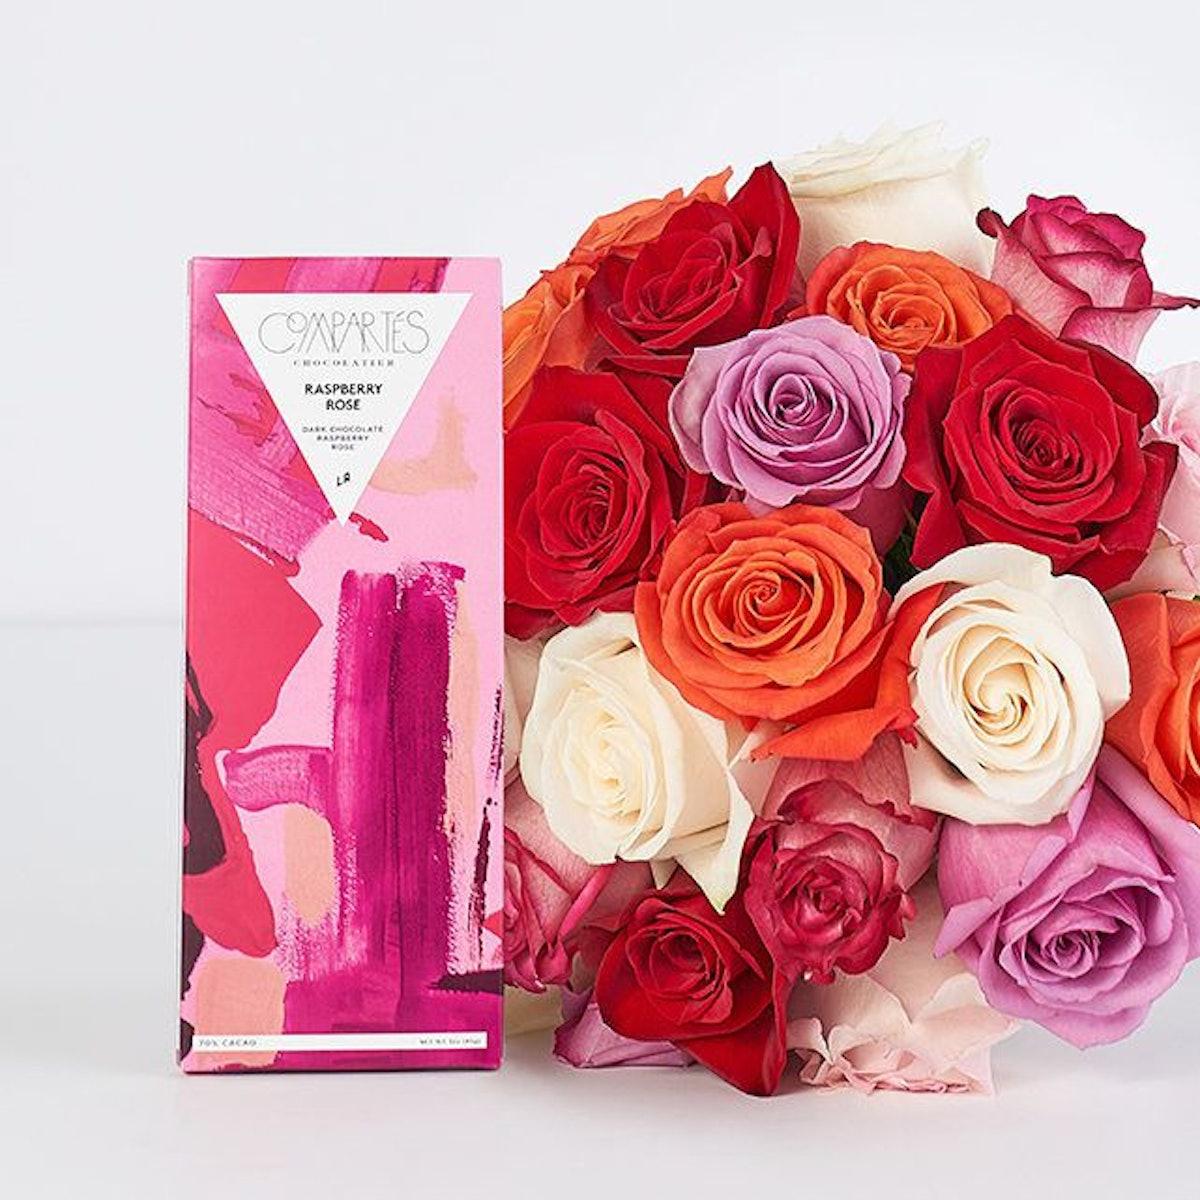 Raspberry Rosé